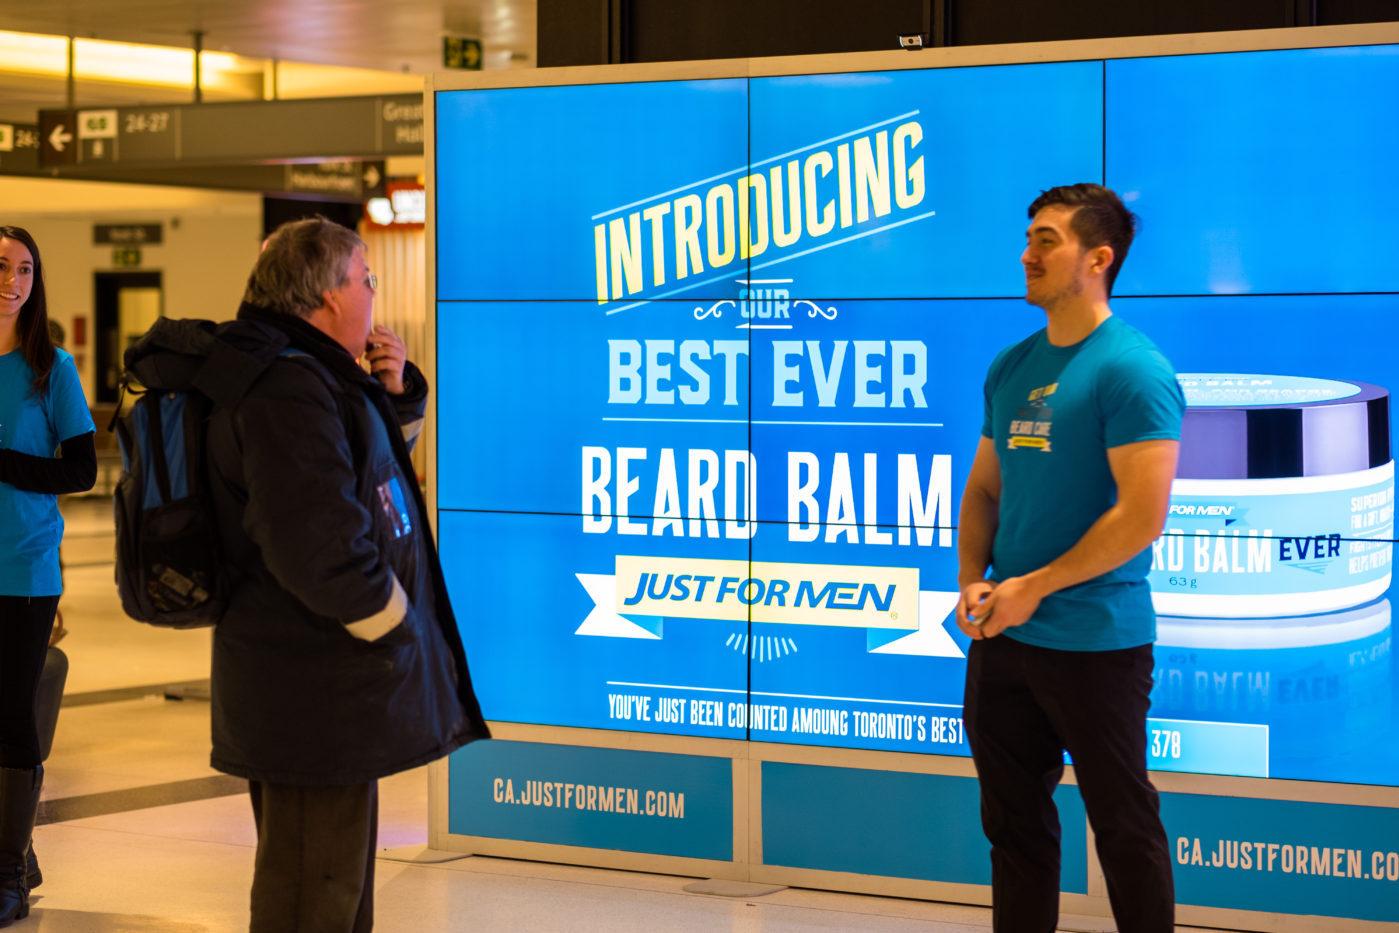 Just For Men - Beard Balm - Union Station - GO Concourse (Toronto, Ontario)